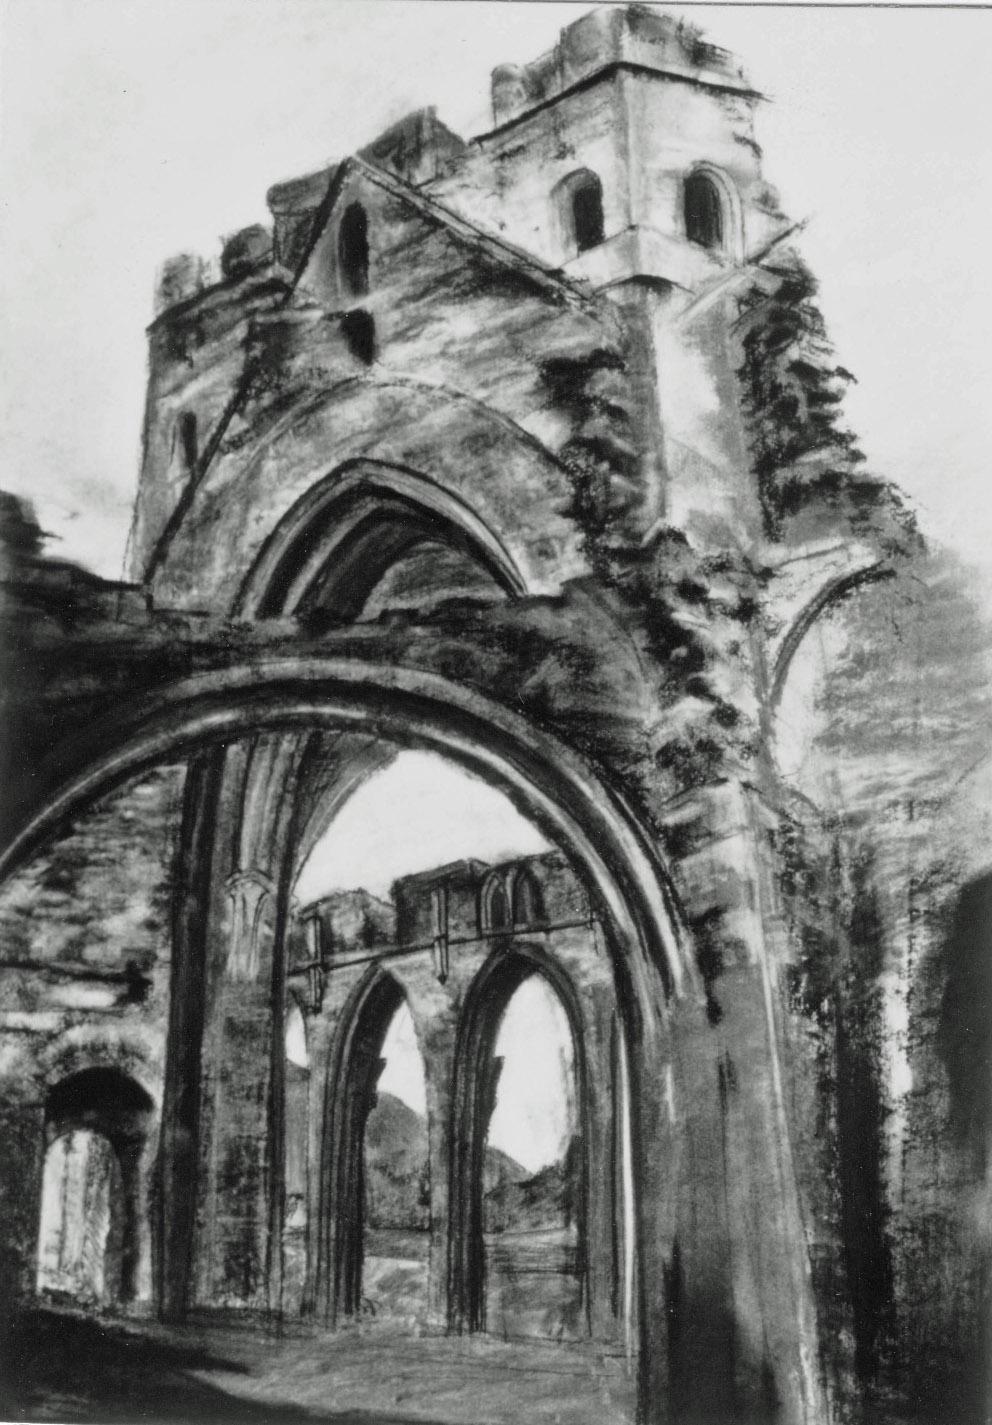 Llanthony Priory 1 small